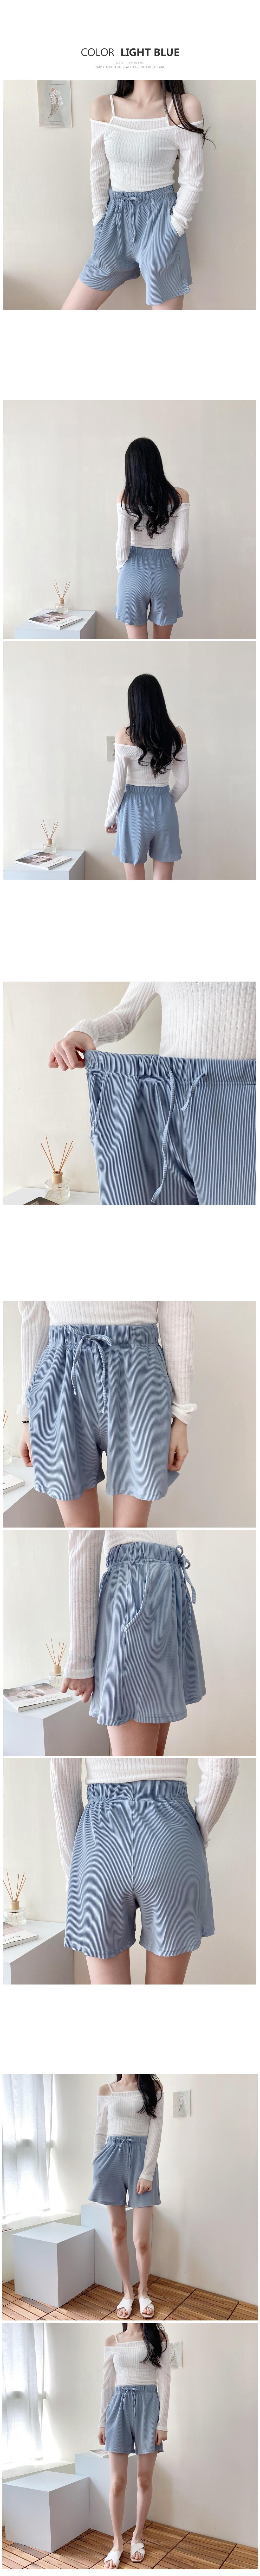 Pleated 3 piece shorts P#YW469